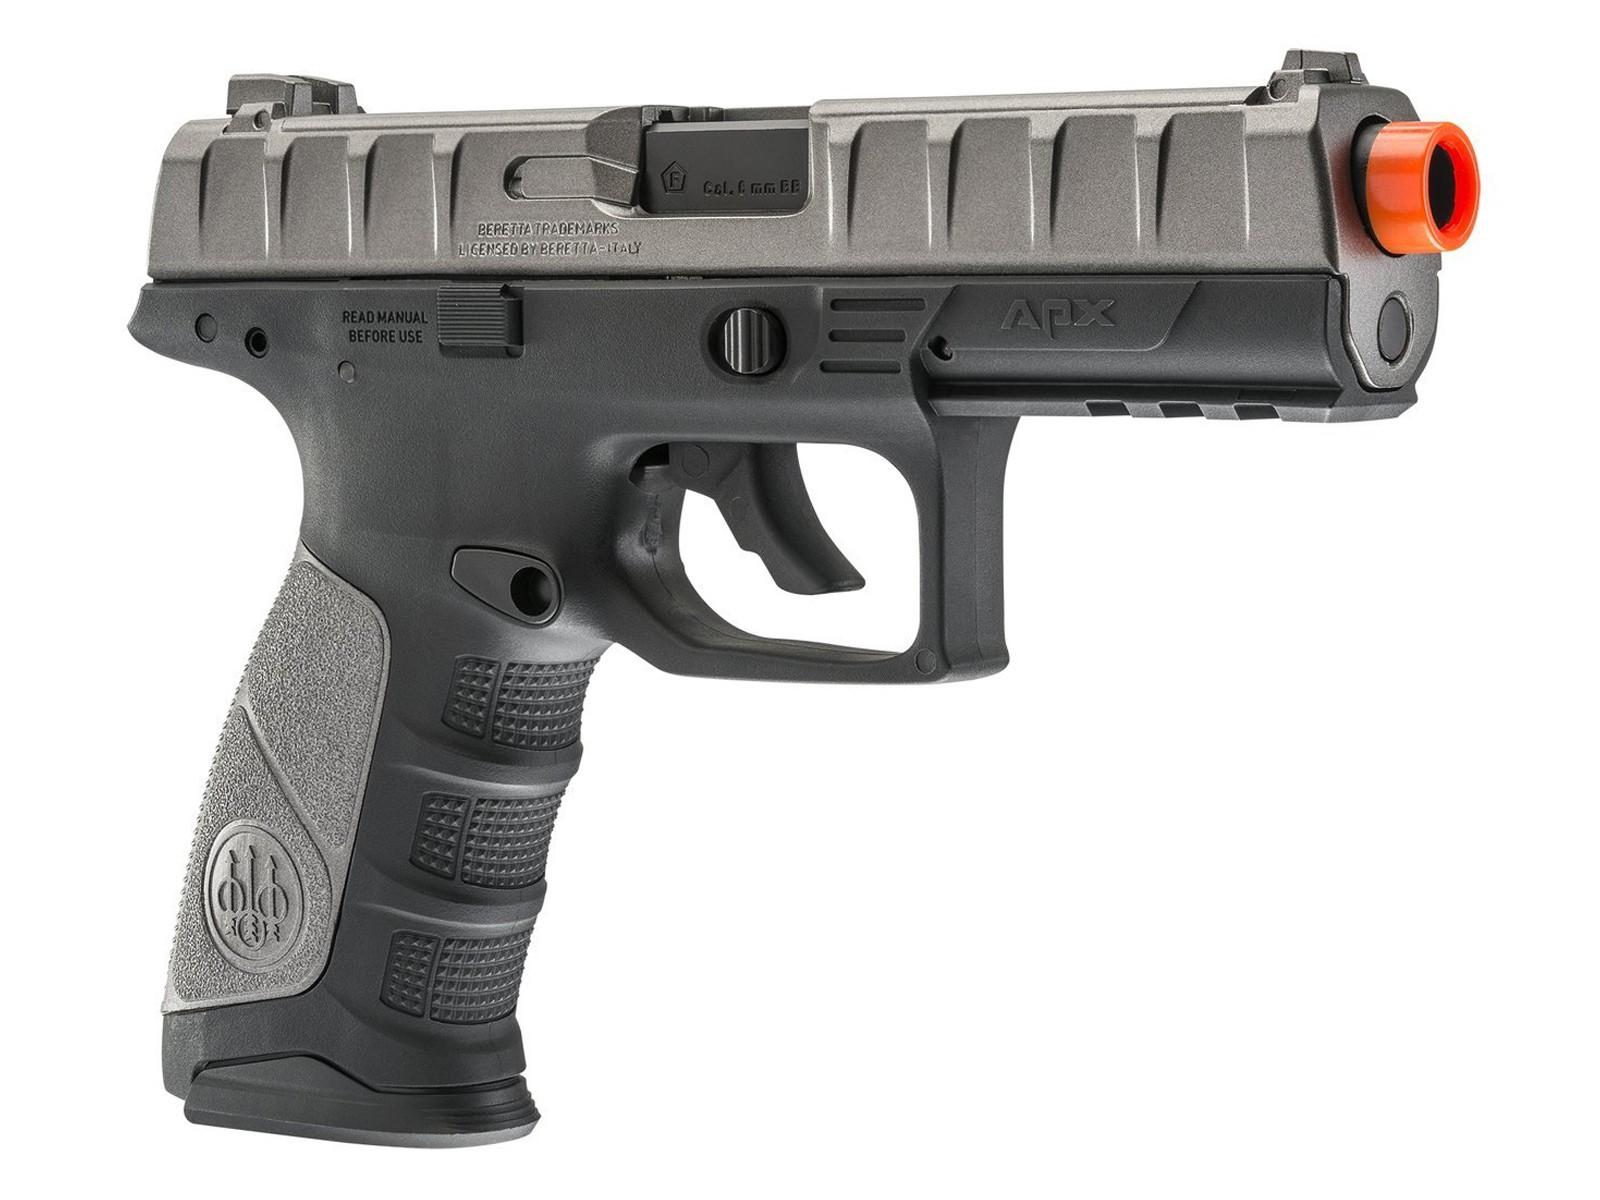 Beretta_APX_CO2_Metal_Slide_Airsoft_Pistol_BlackSilver_6mm